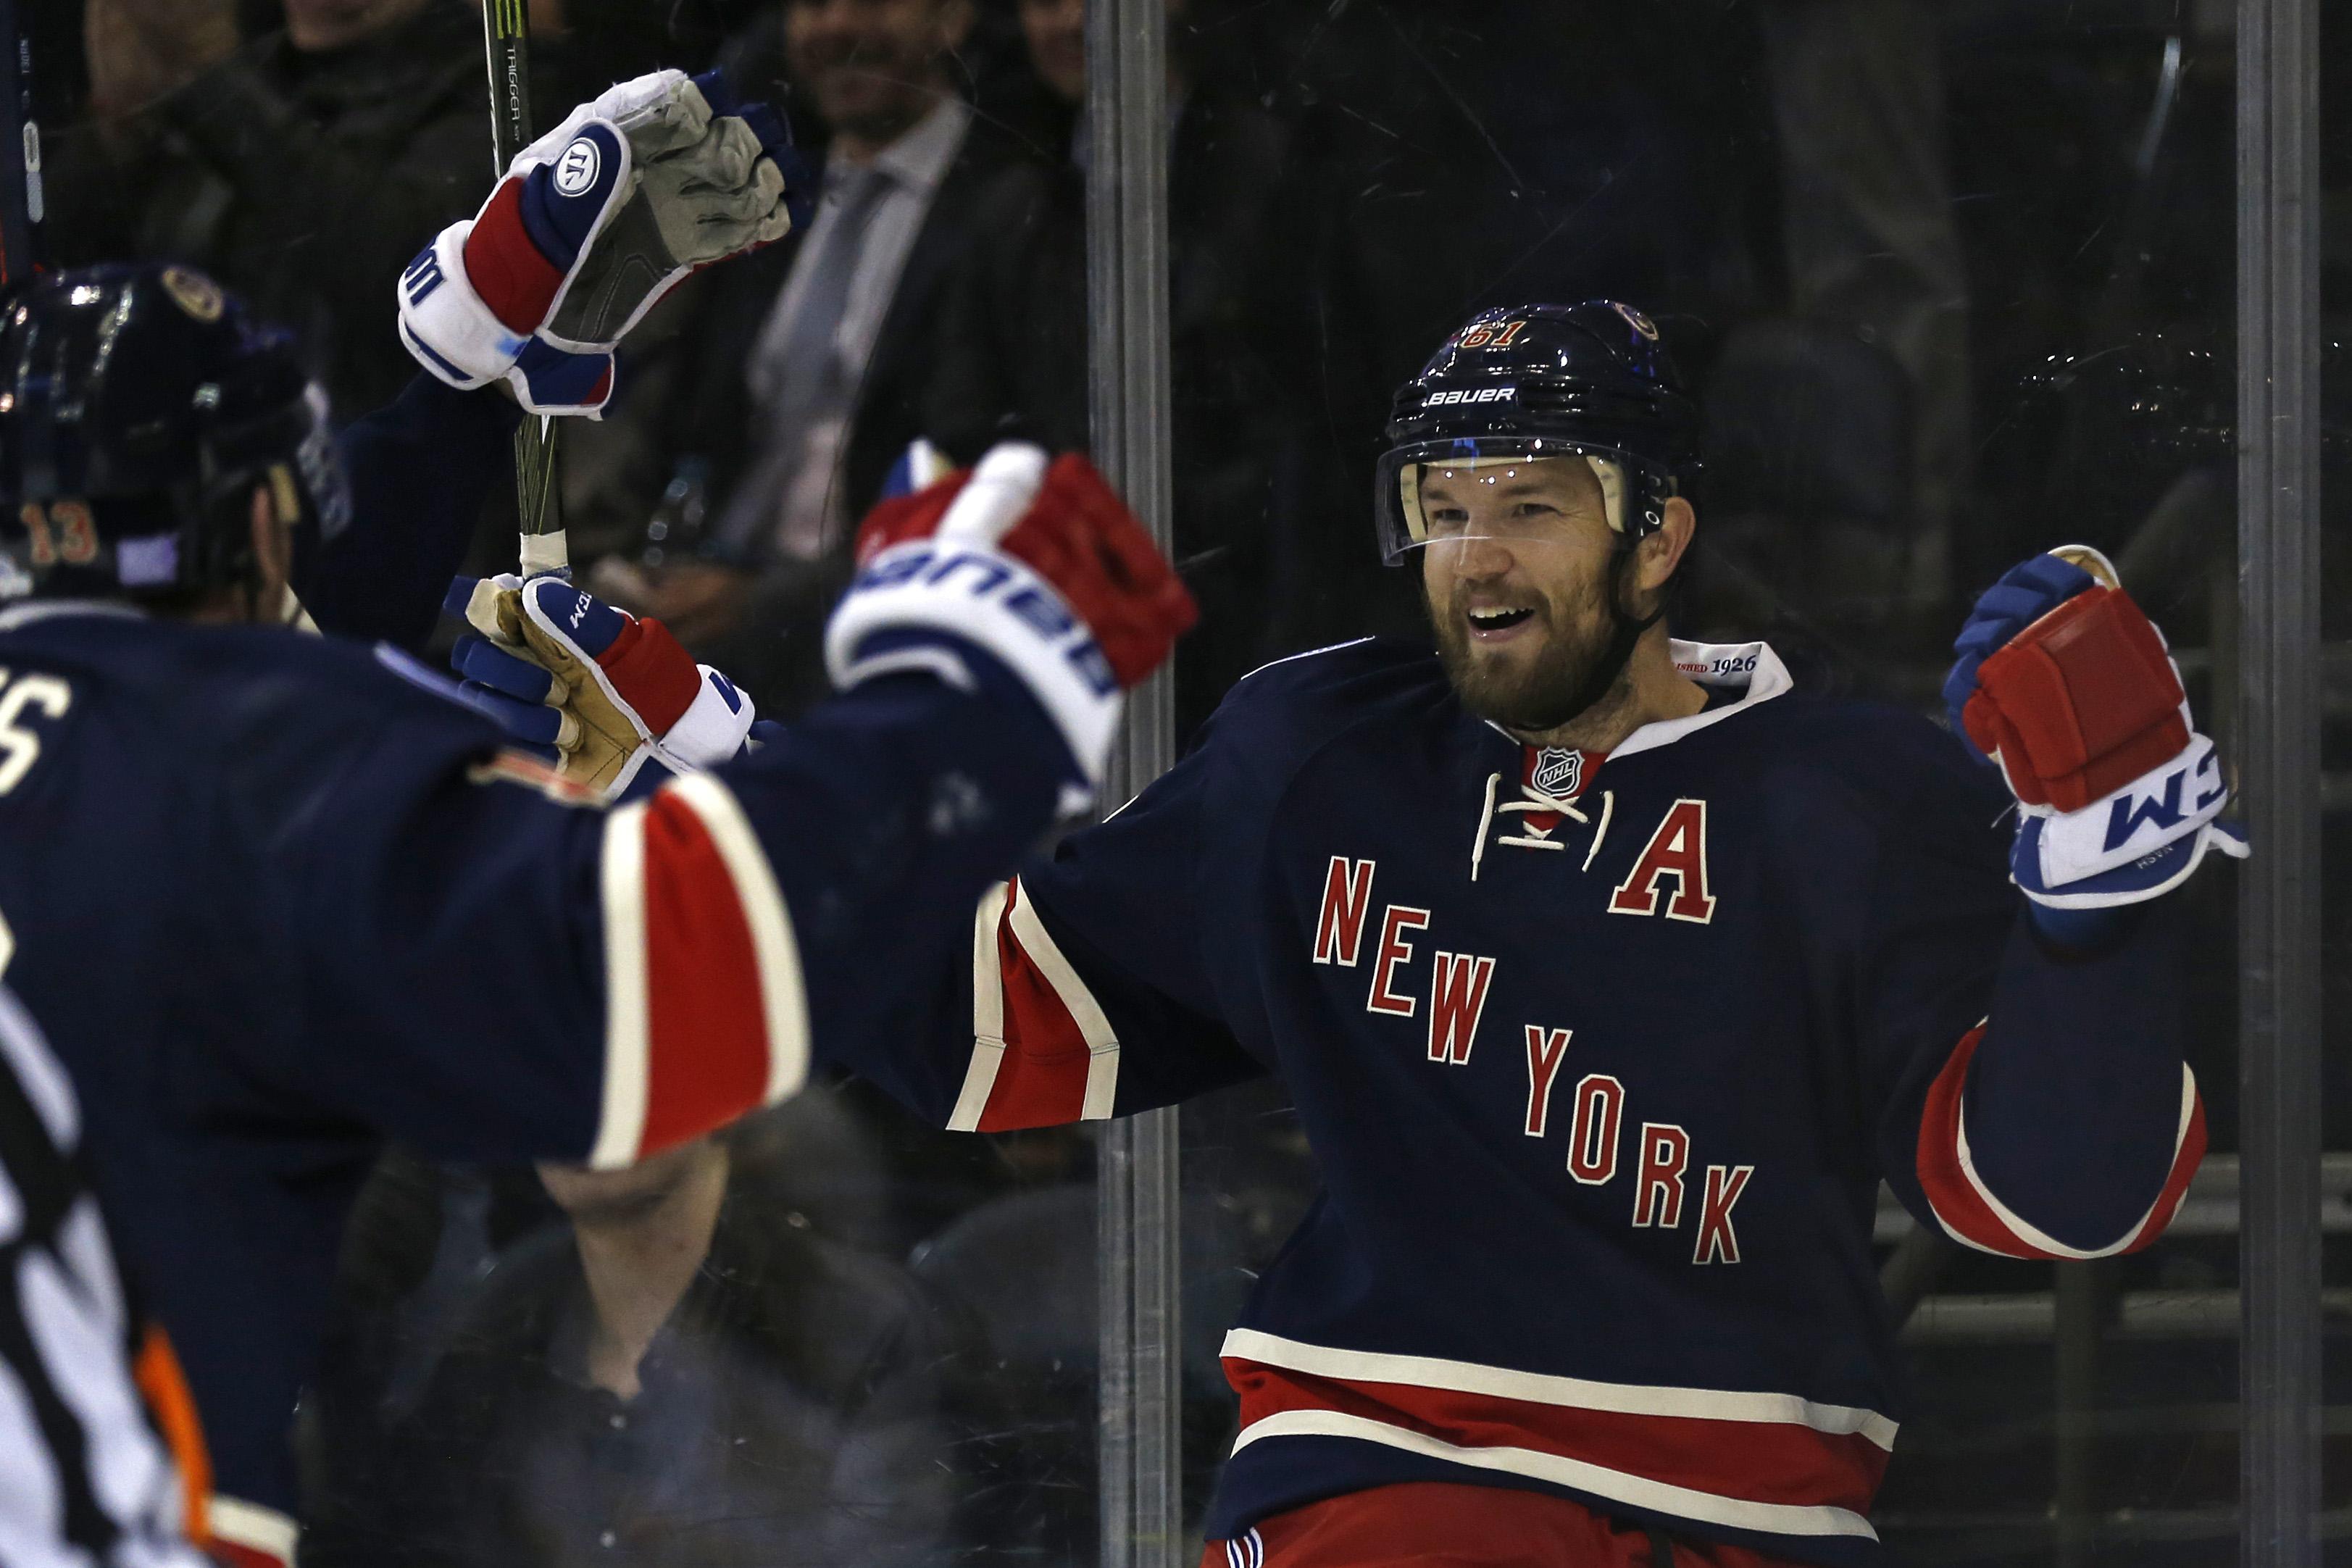 New York Rangers Dominate Boston Bruins Behind Brandon Pirri's Two Goals (Highlights)